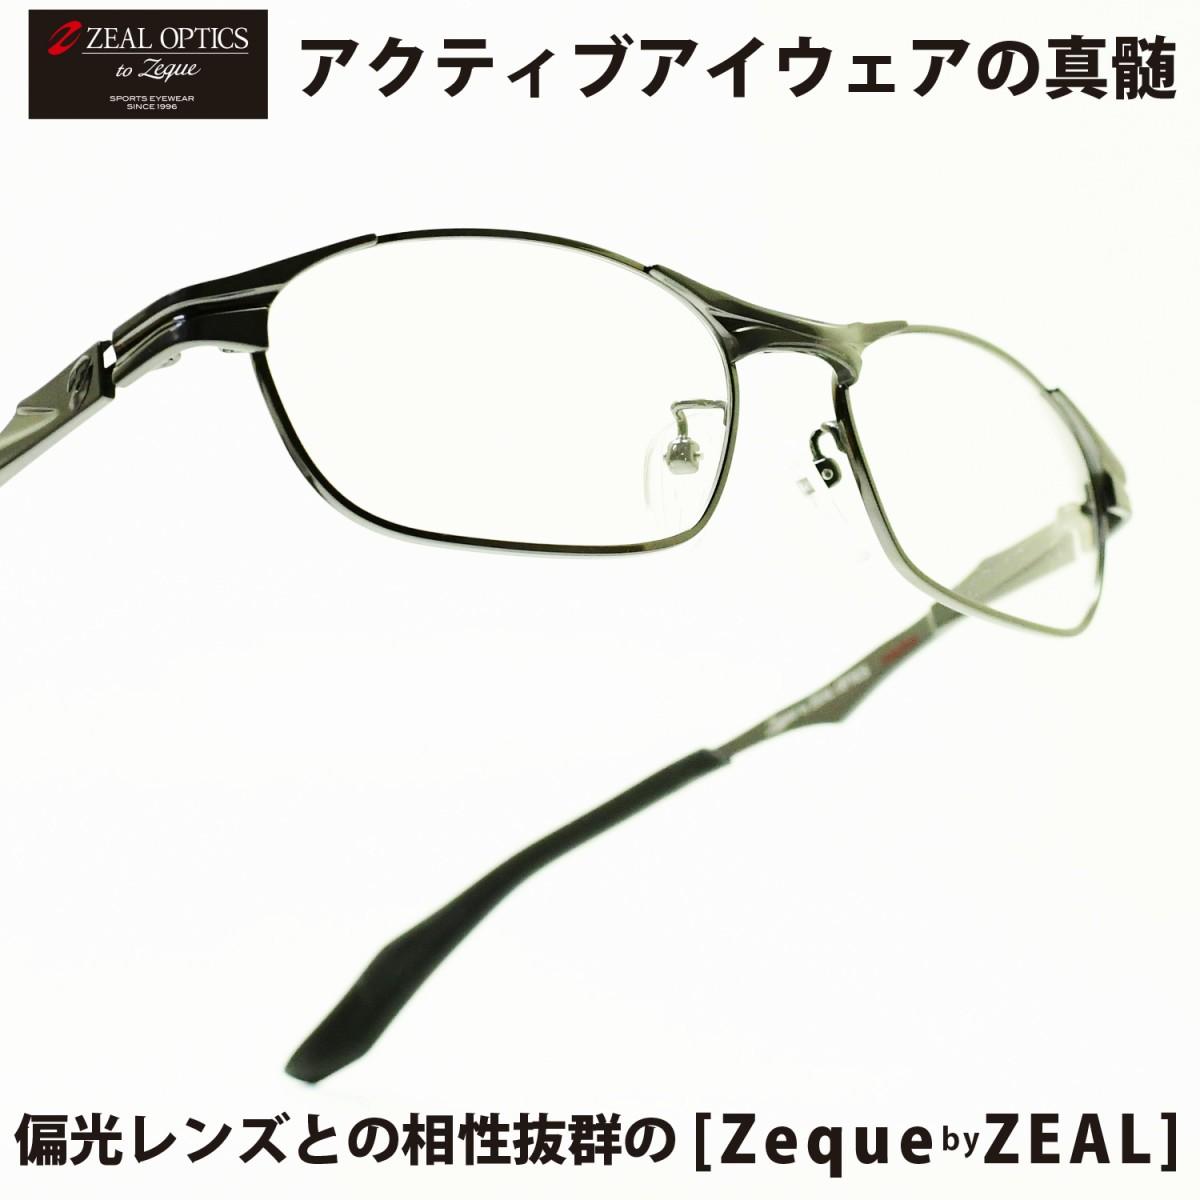 ZEAL ジール Zeque by ZEAL OPTICSAVENGE elf アベンジエルフCHROME GUNMETALメガネ 眼鏡 めがね メンズ レディース おしゃれ ブランド 人気 おすすめ フレーム 流行り 度付き レンズ